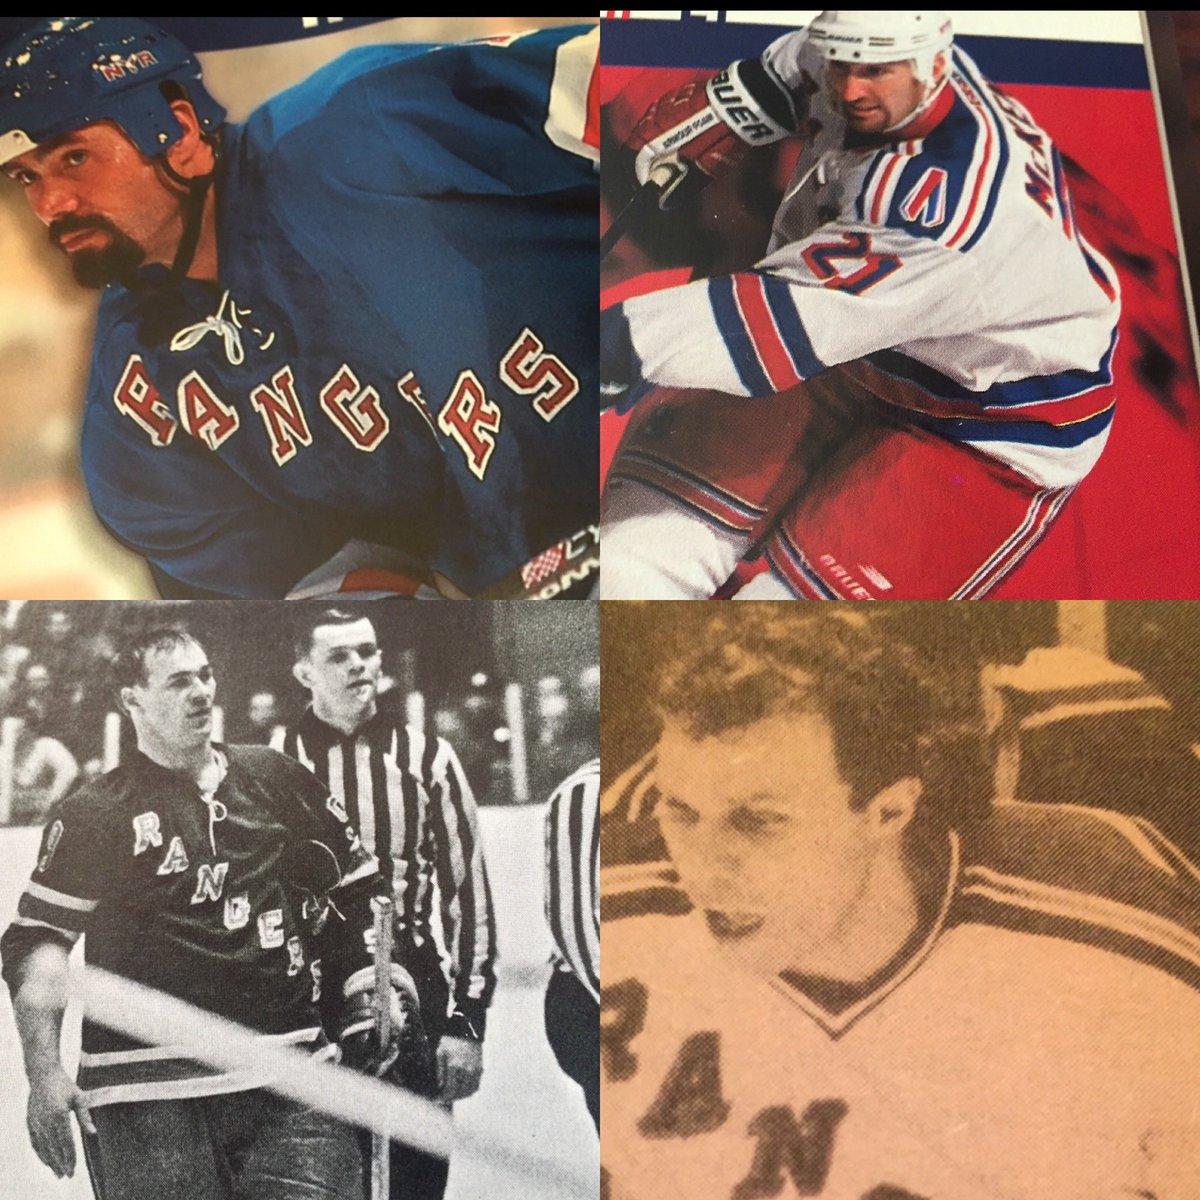 #51 Let's focus on these 4 Ranger tough guys. How many can you name? #nyrangersfan #nyr #tough #guys #rangers #nhl https://t.co/NAHiMvwhX8